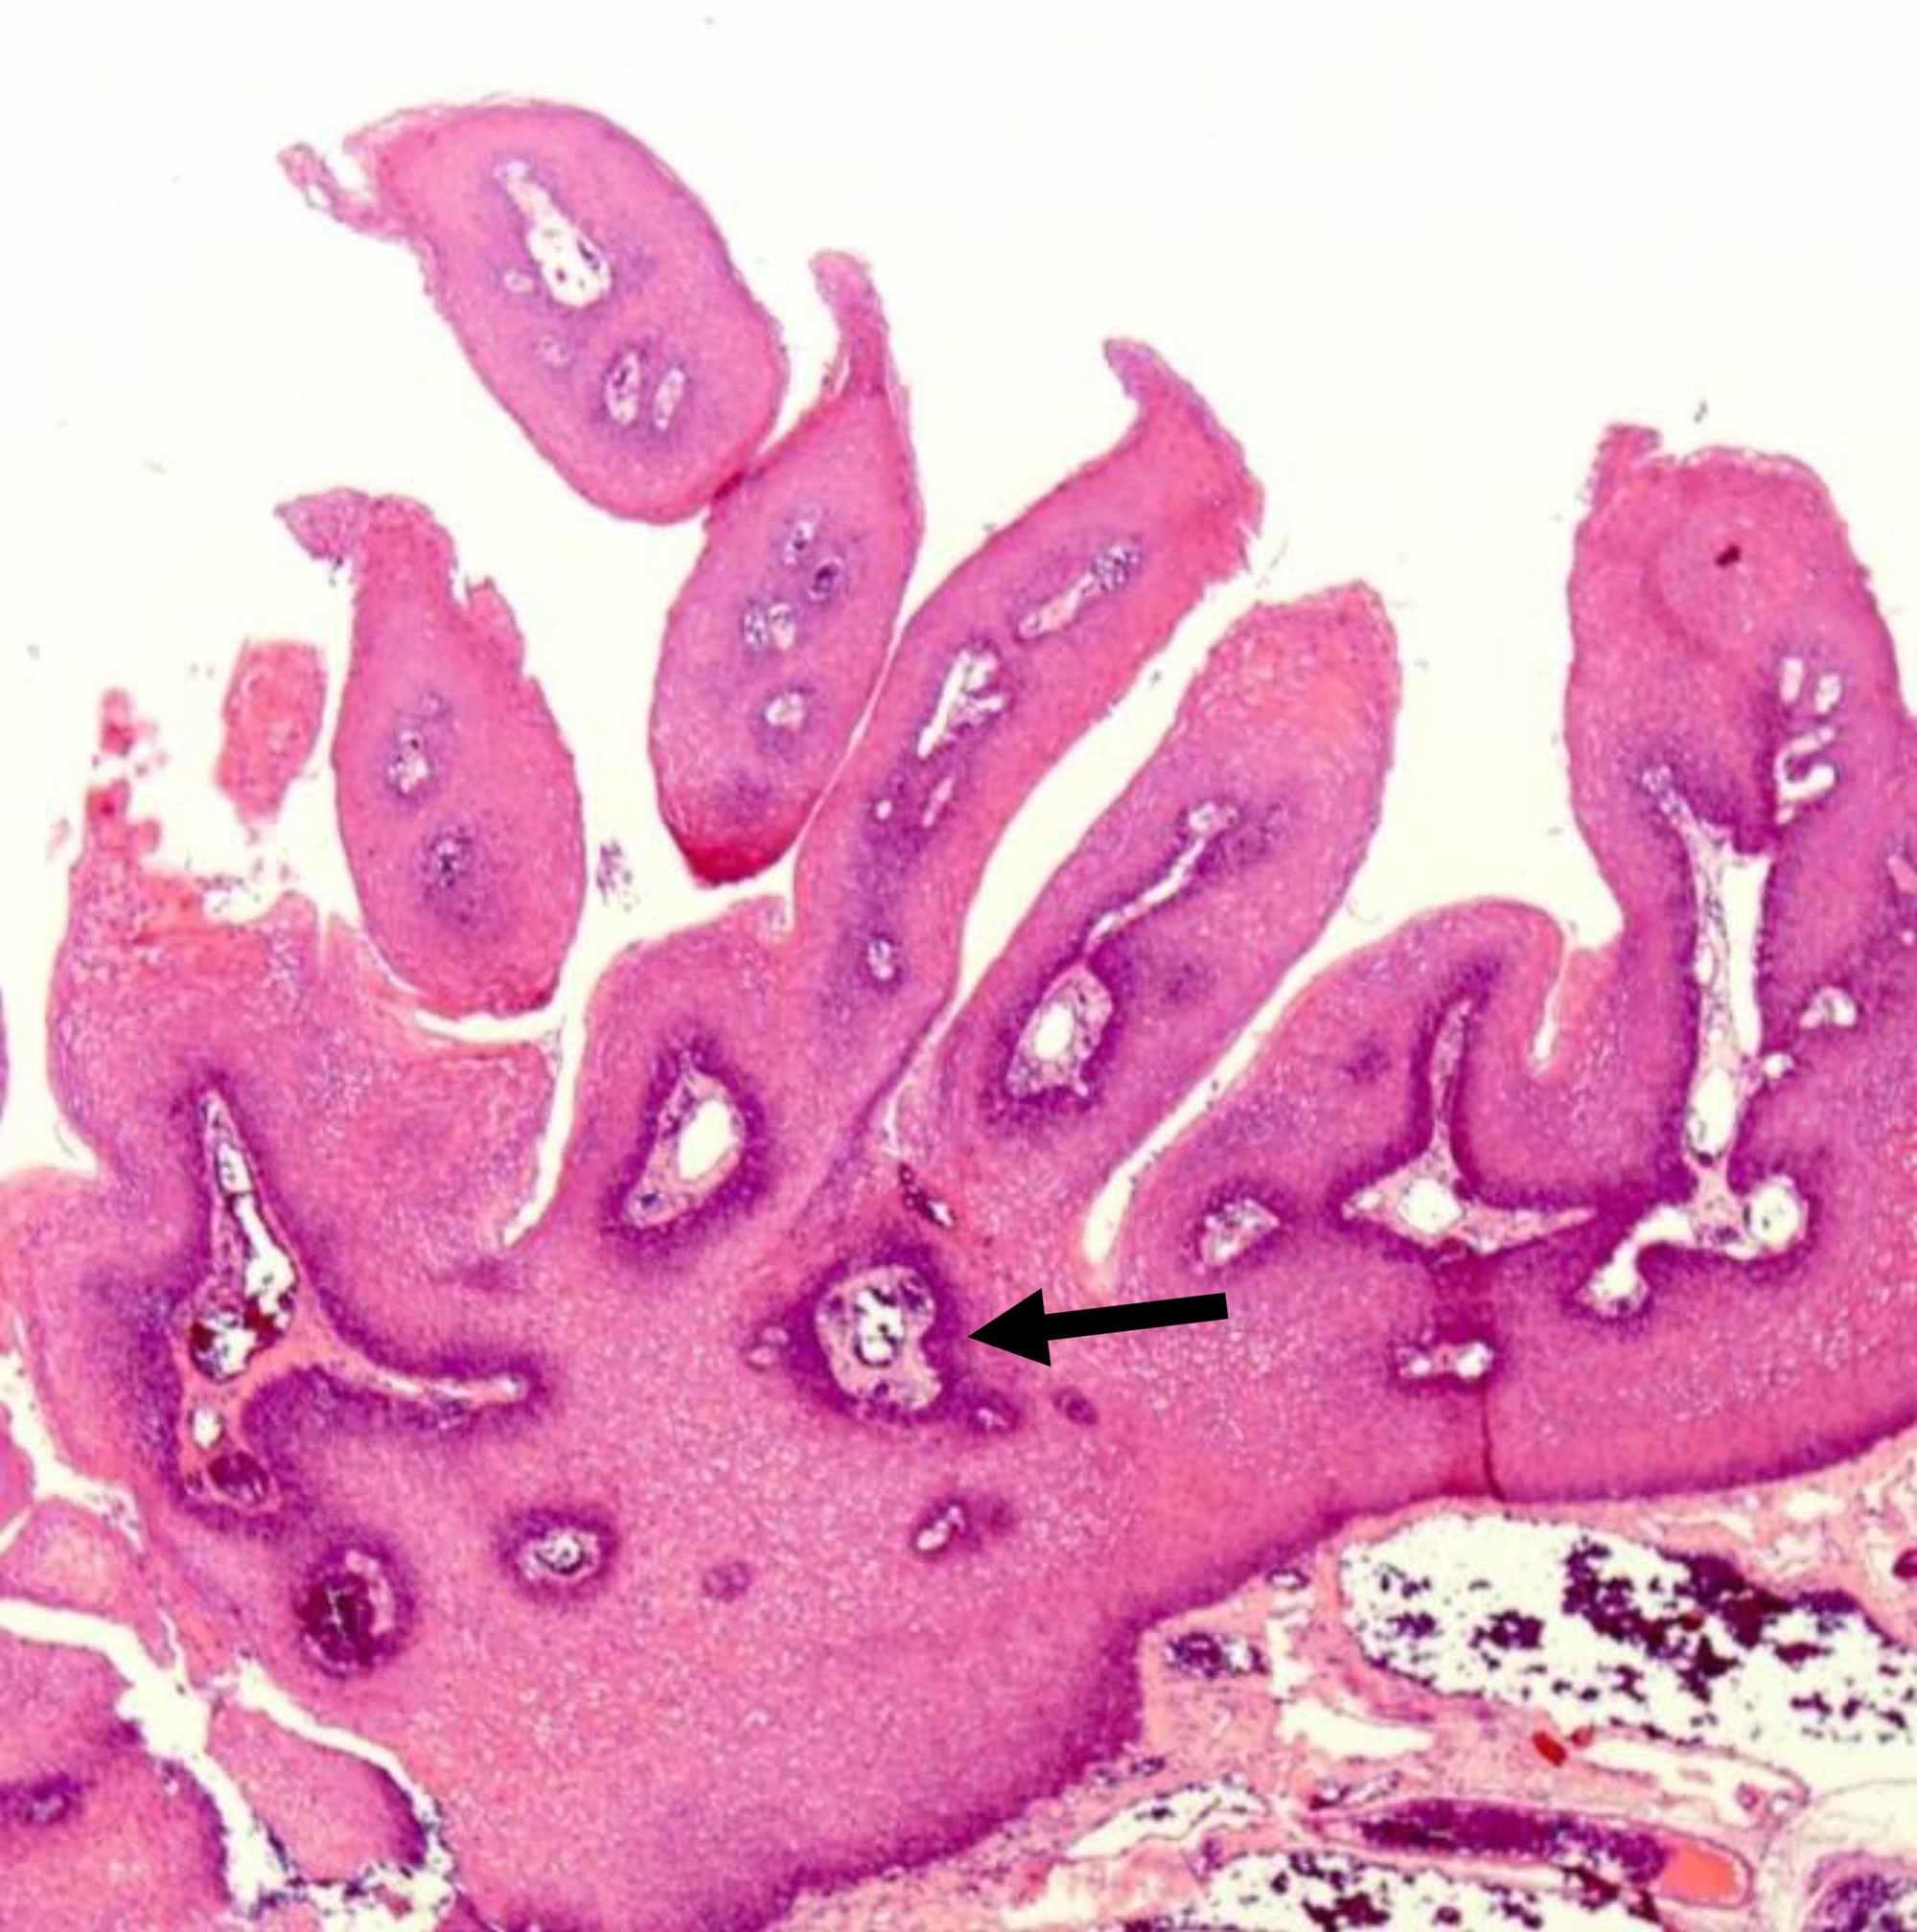 simptome bărbătesc vierme endometrial cancer etiology